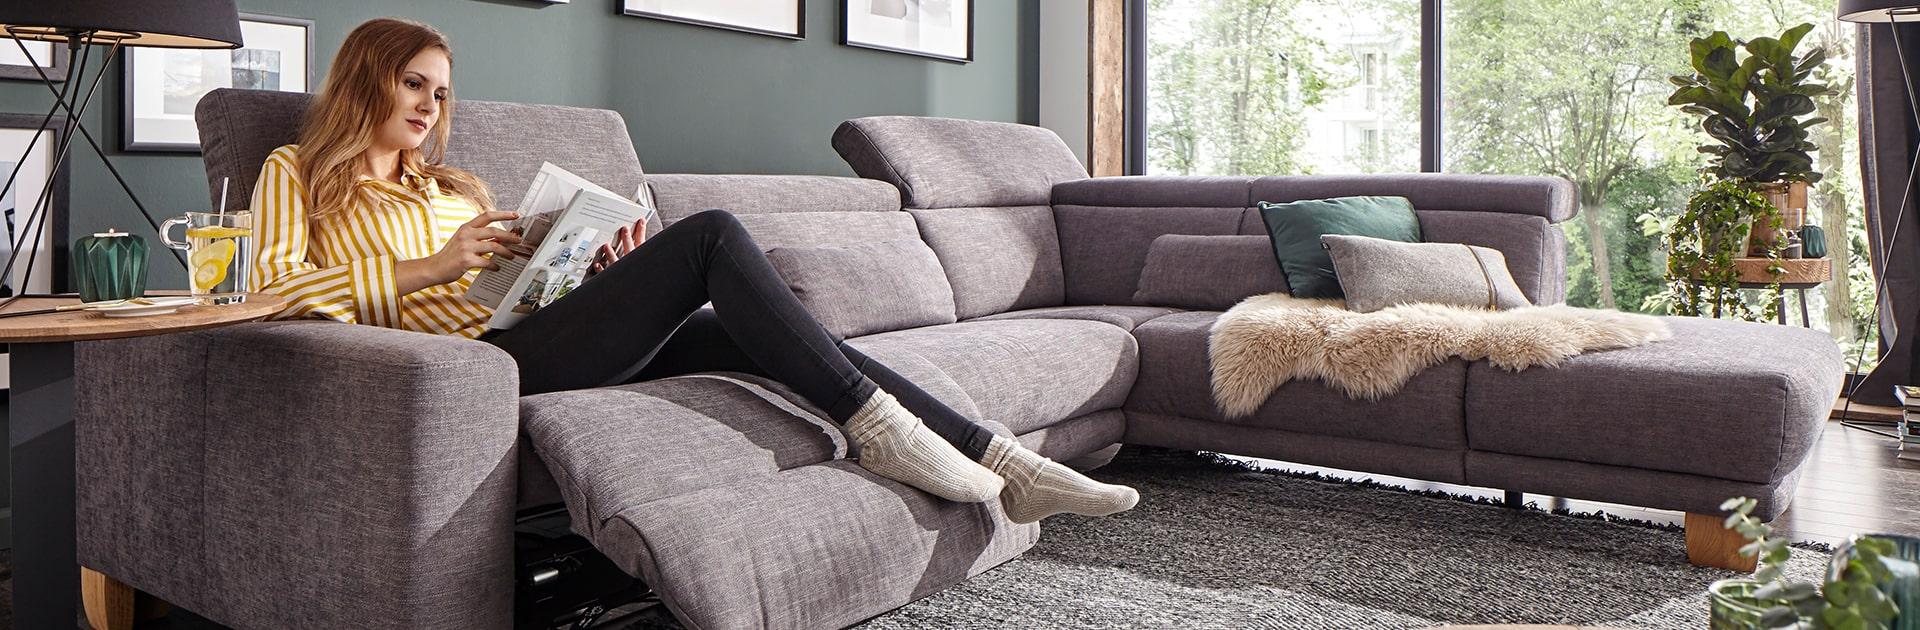 Full Size of Natura Sofa Couch Kansas Newport Livingston Love Denver Brooklyn Home Gebraucht Maryland Fr Authentisches Und Funktionales Wohnen Liege Rahaus Schlafsofa Sofa Natura Sofa